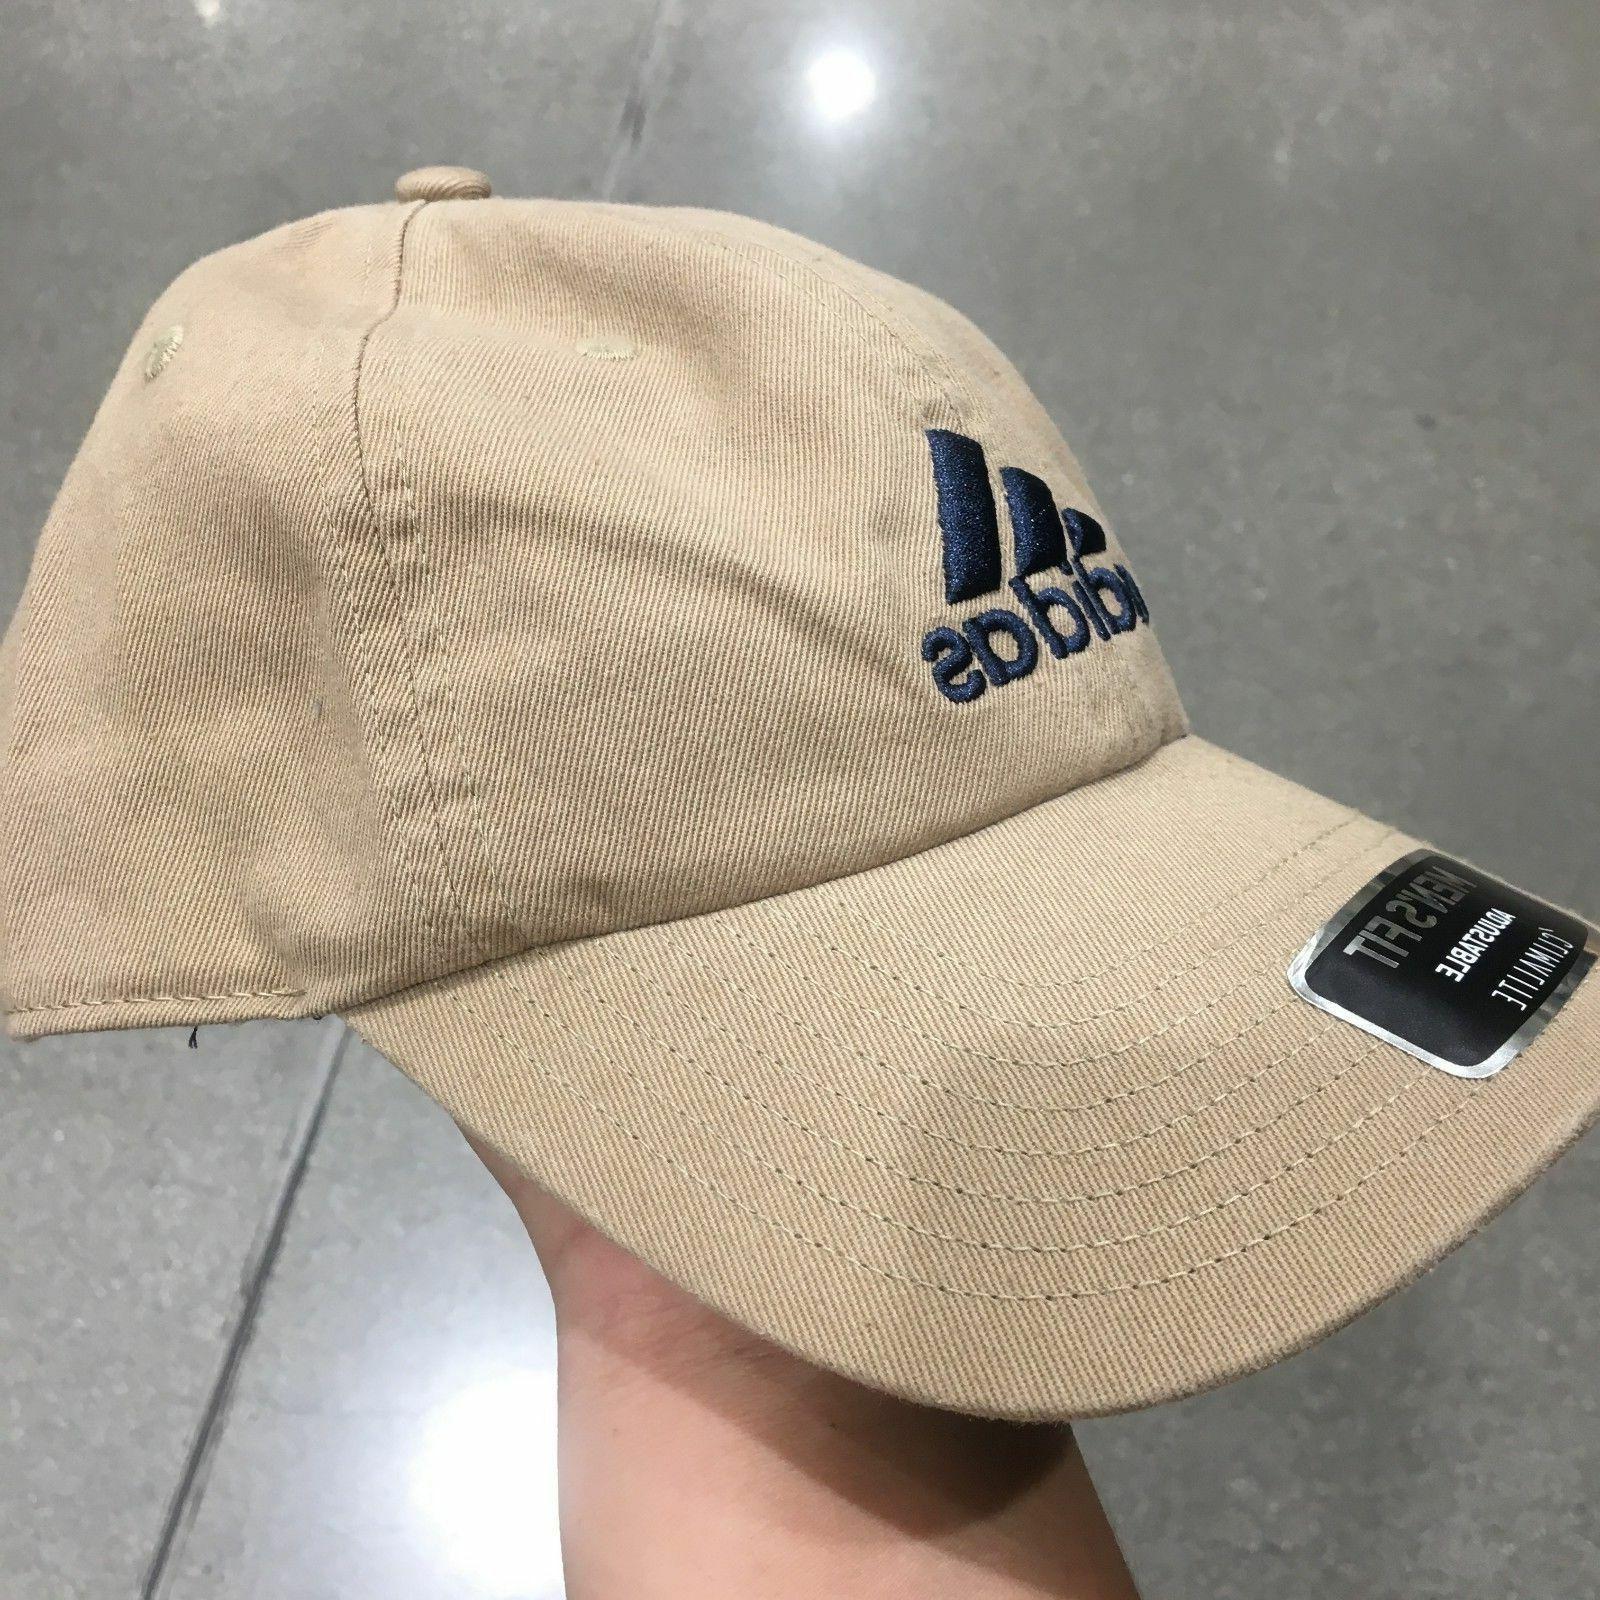 Adidas Men's Hat Baseball Cap -Select